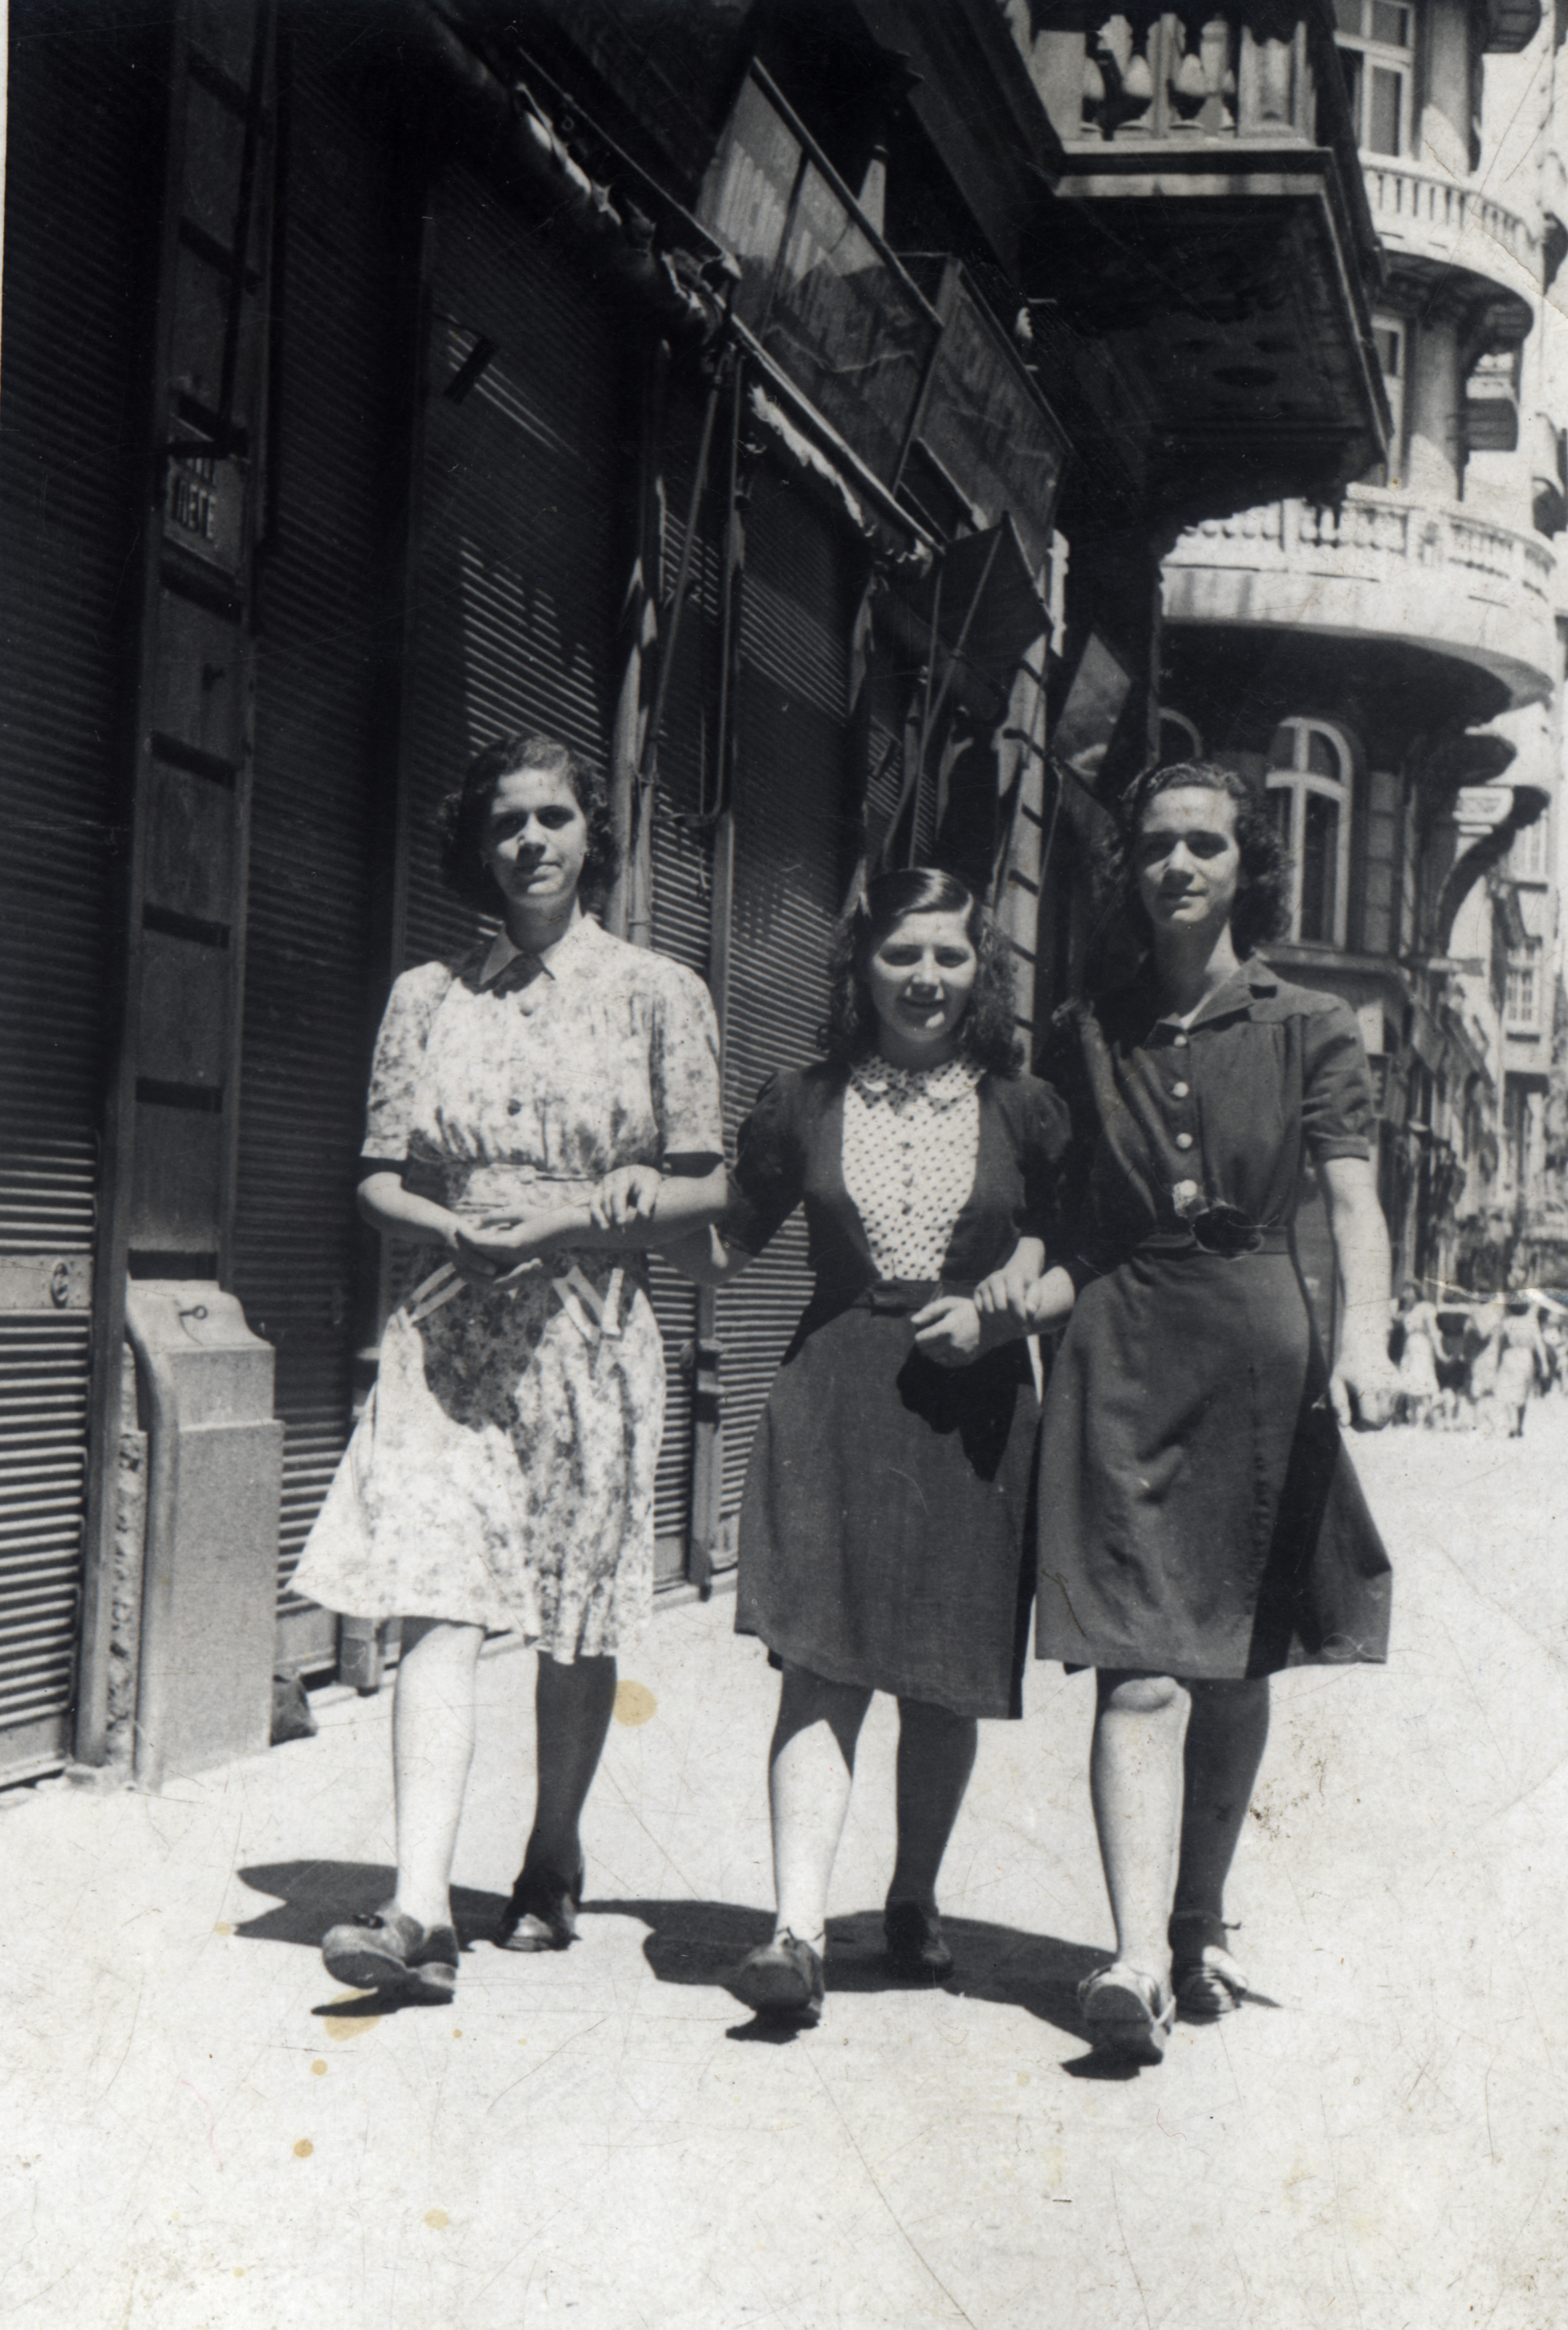 Roza Anzhel, Tsivi Nusan and Ester Galvy